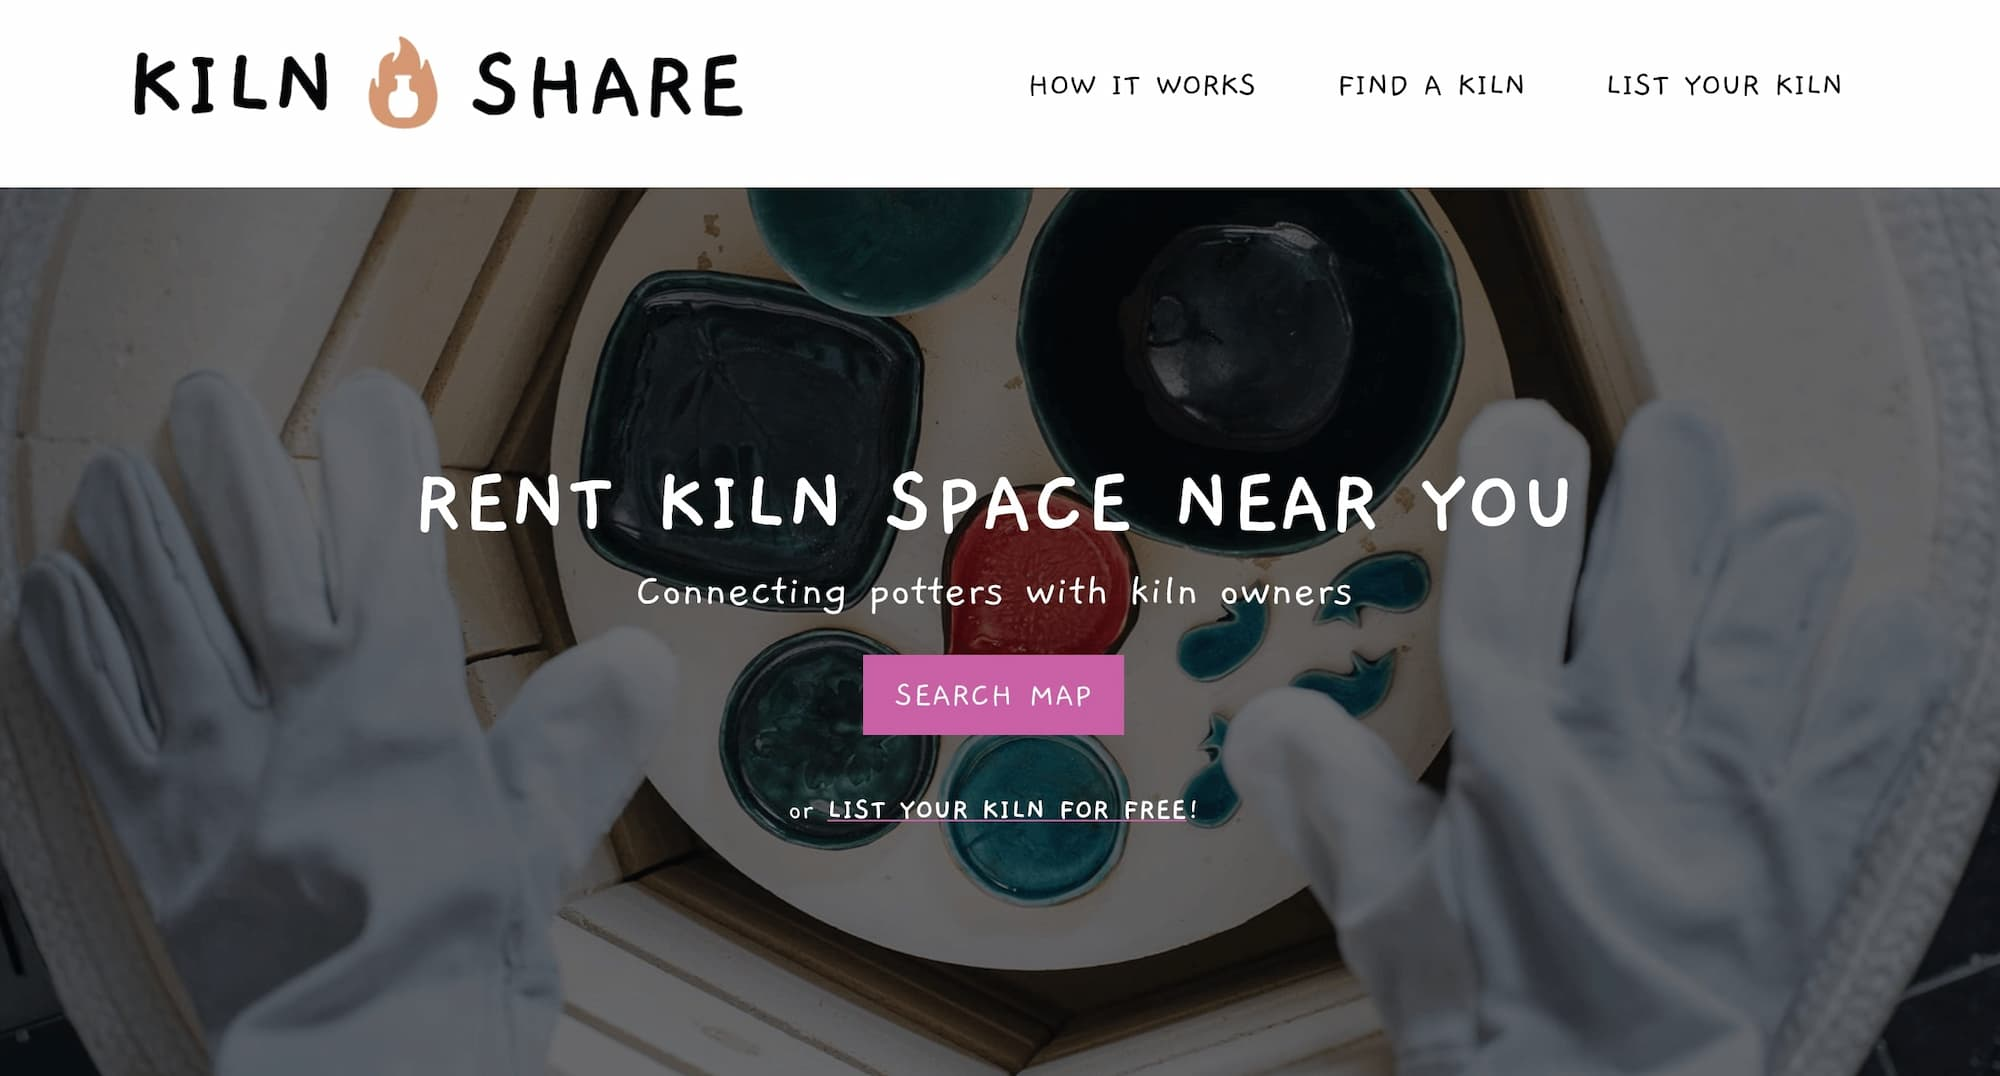 Kiln Share project